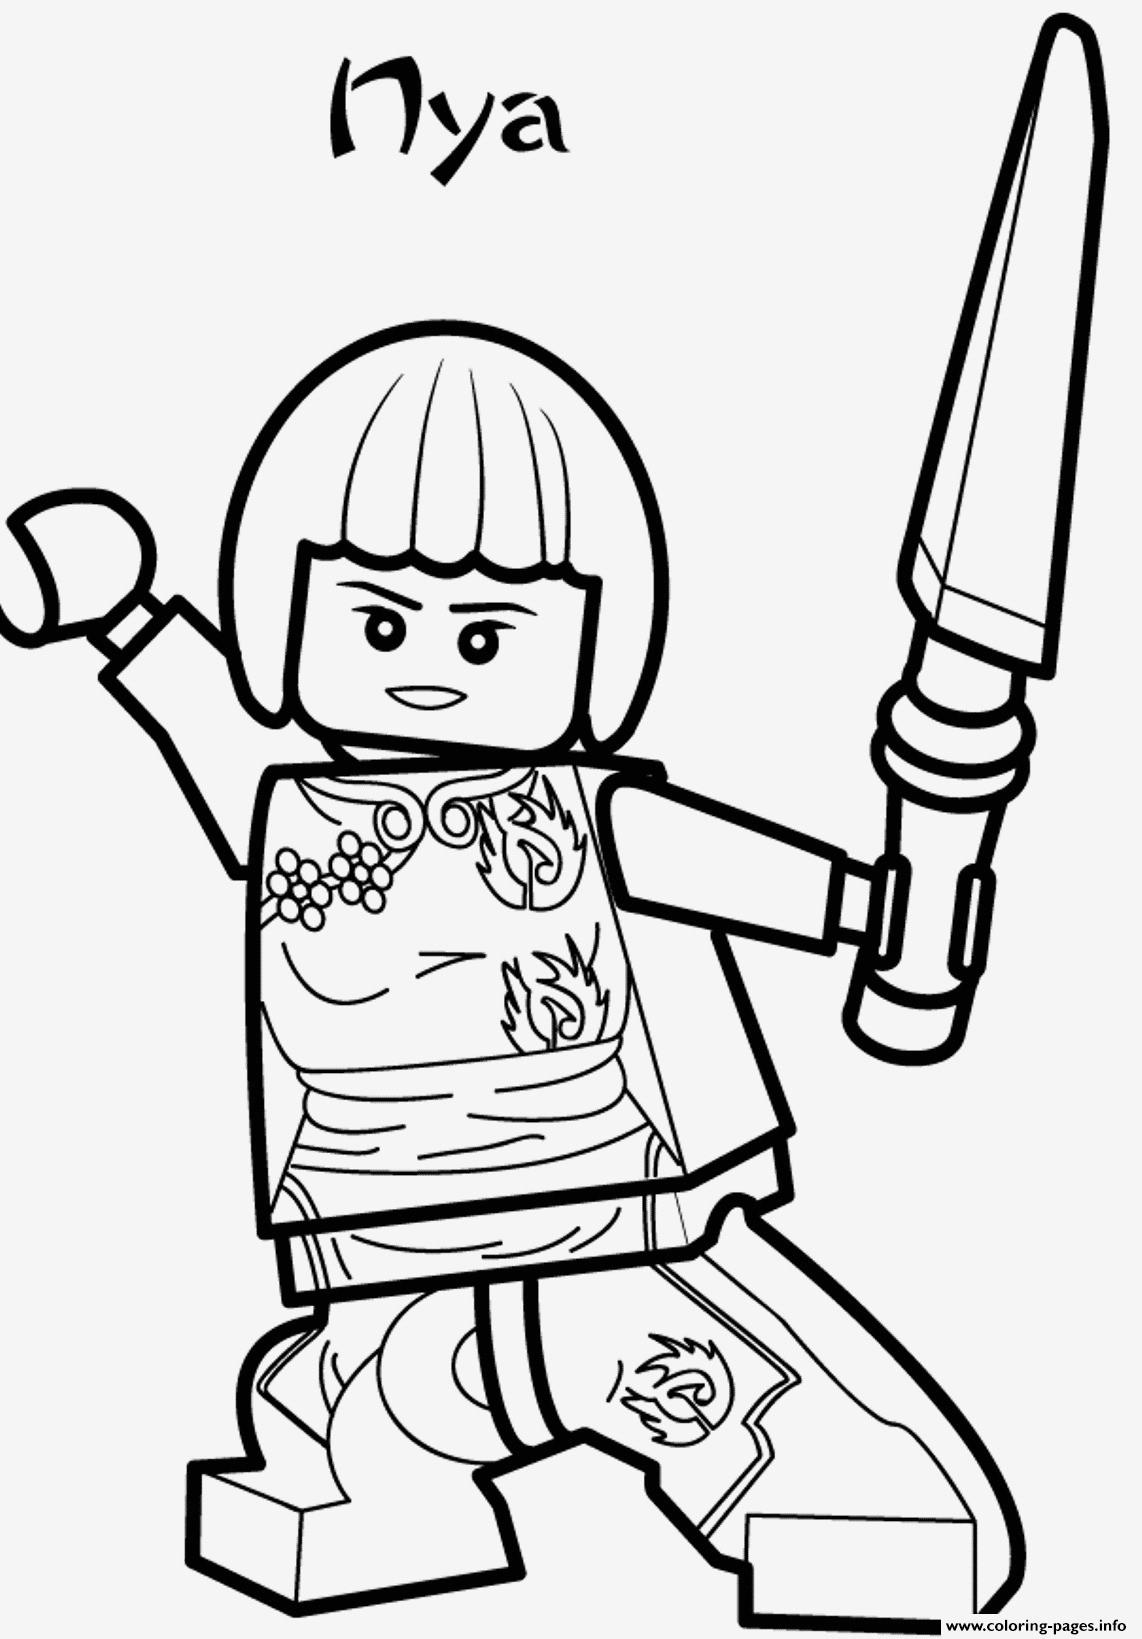 Ninjago Lego Ausmalbilder Frisch Lego Ninjago Ausmalbild Bilder Zum Ausmalen Bekommen Ninjago Jay Sammlung